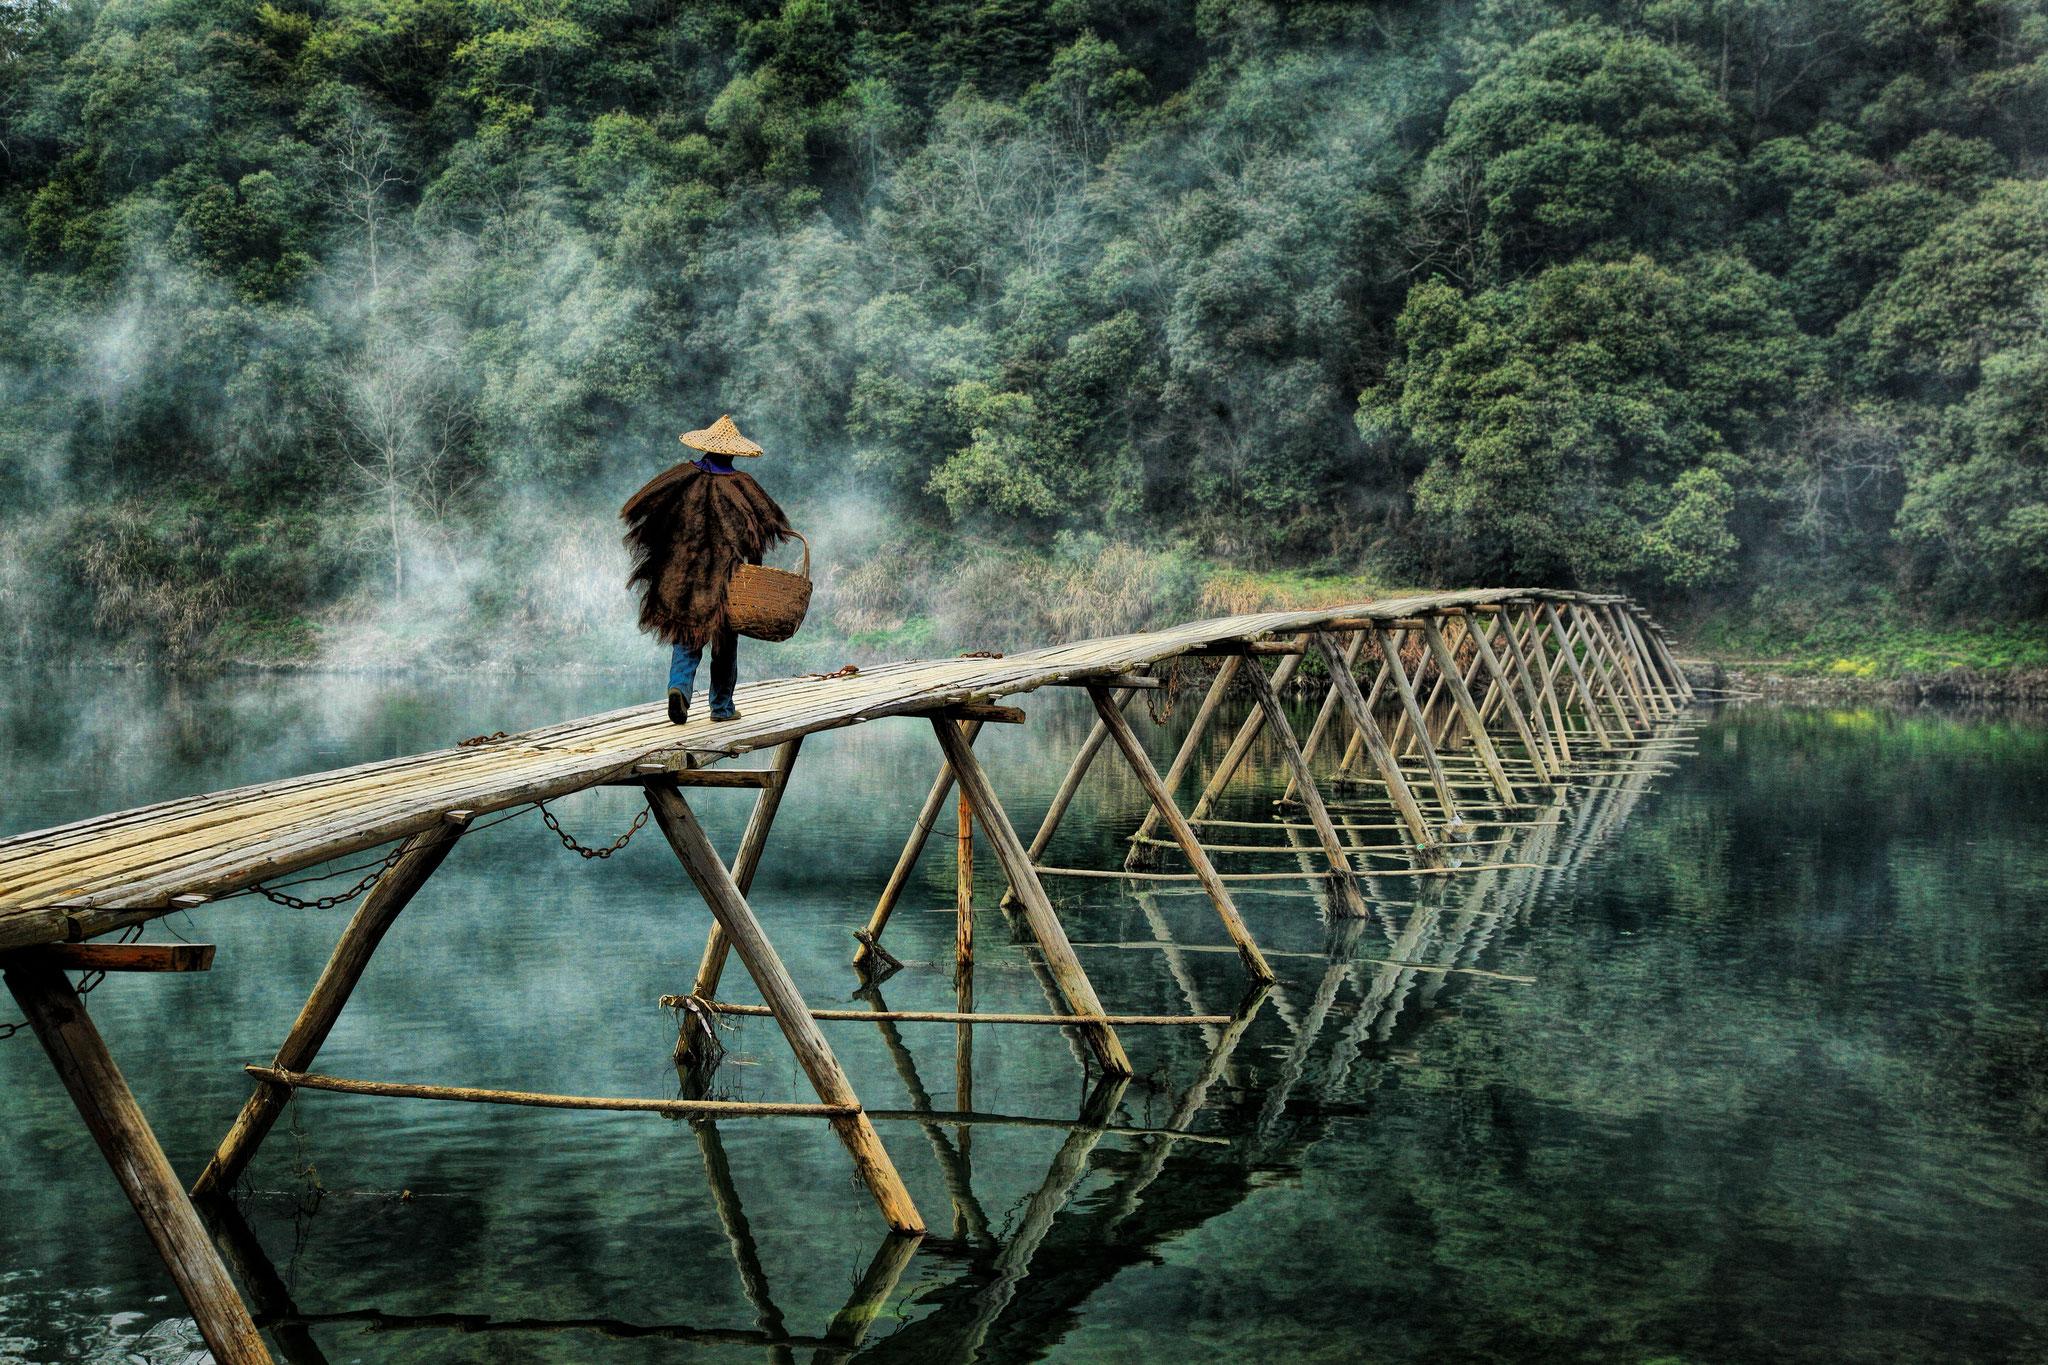 Steven Yee (Singapore) - Lishui Fisherman Bridge